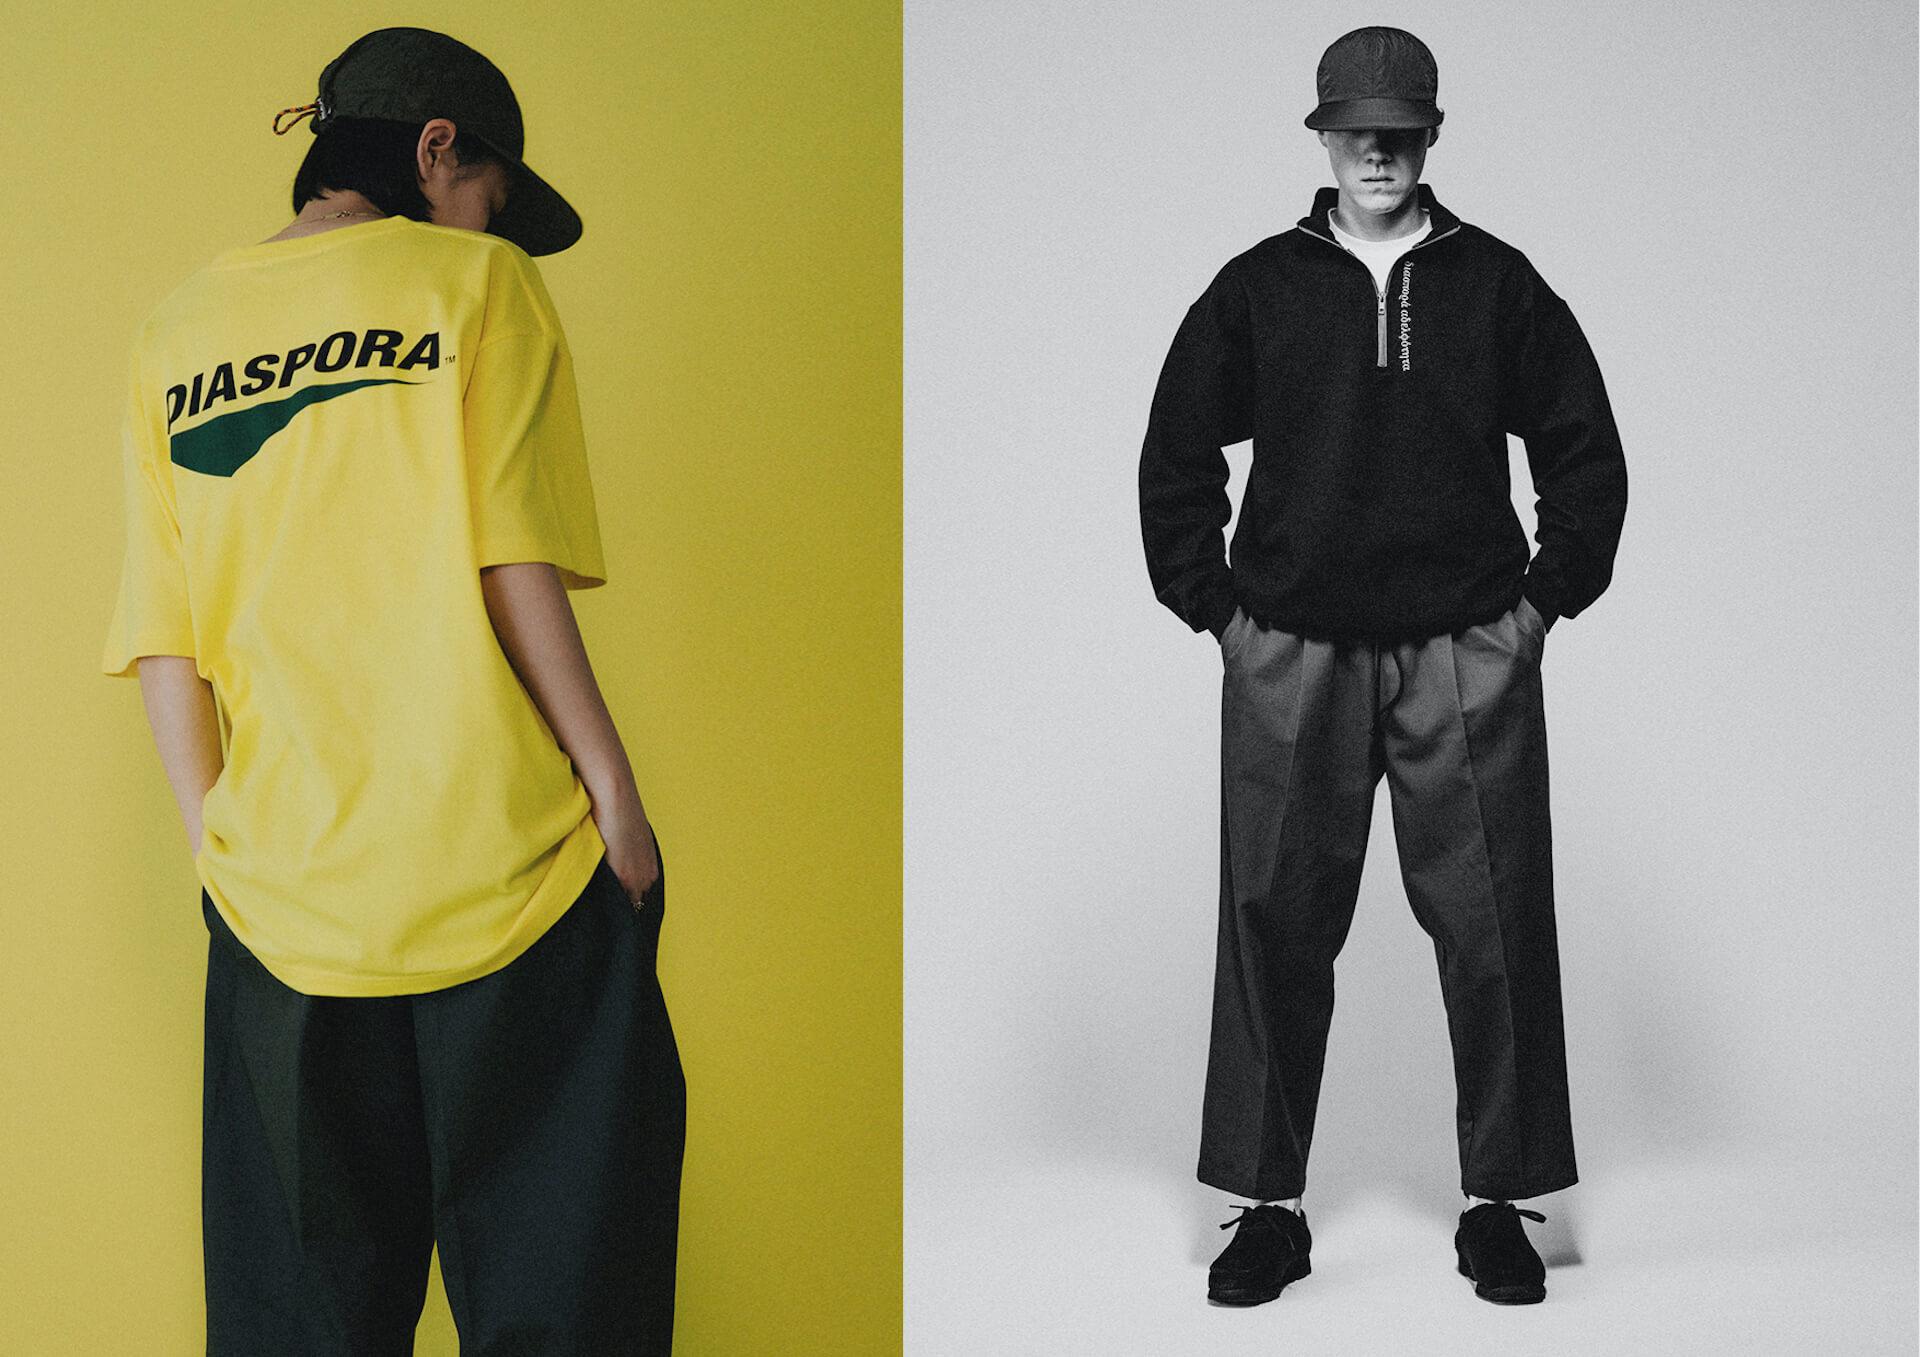 Diaspora skateboardsが2021SSのルックビジュアルを公開!モデルにはmiuらを起用 fashion210225_diasporaskateboards-03